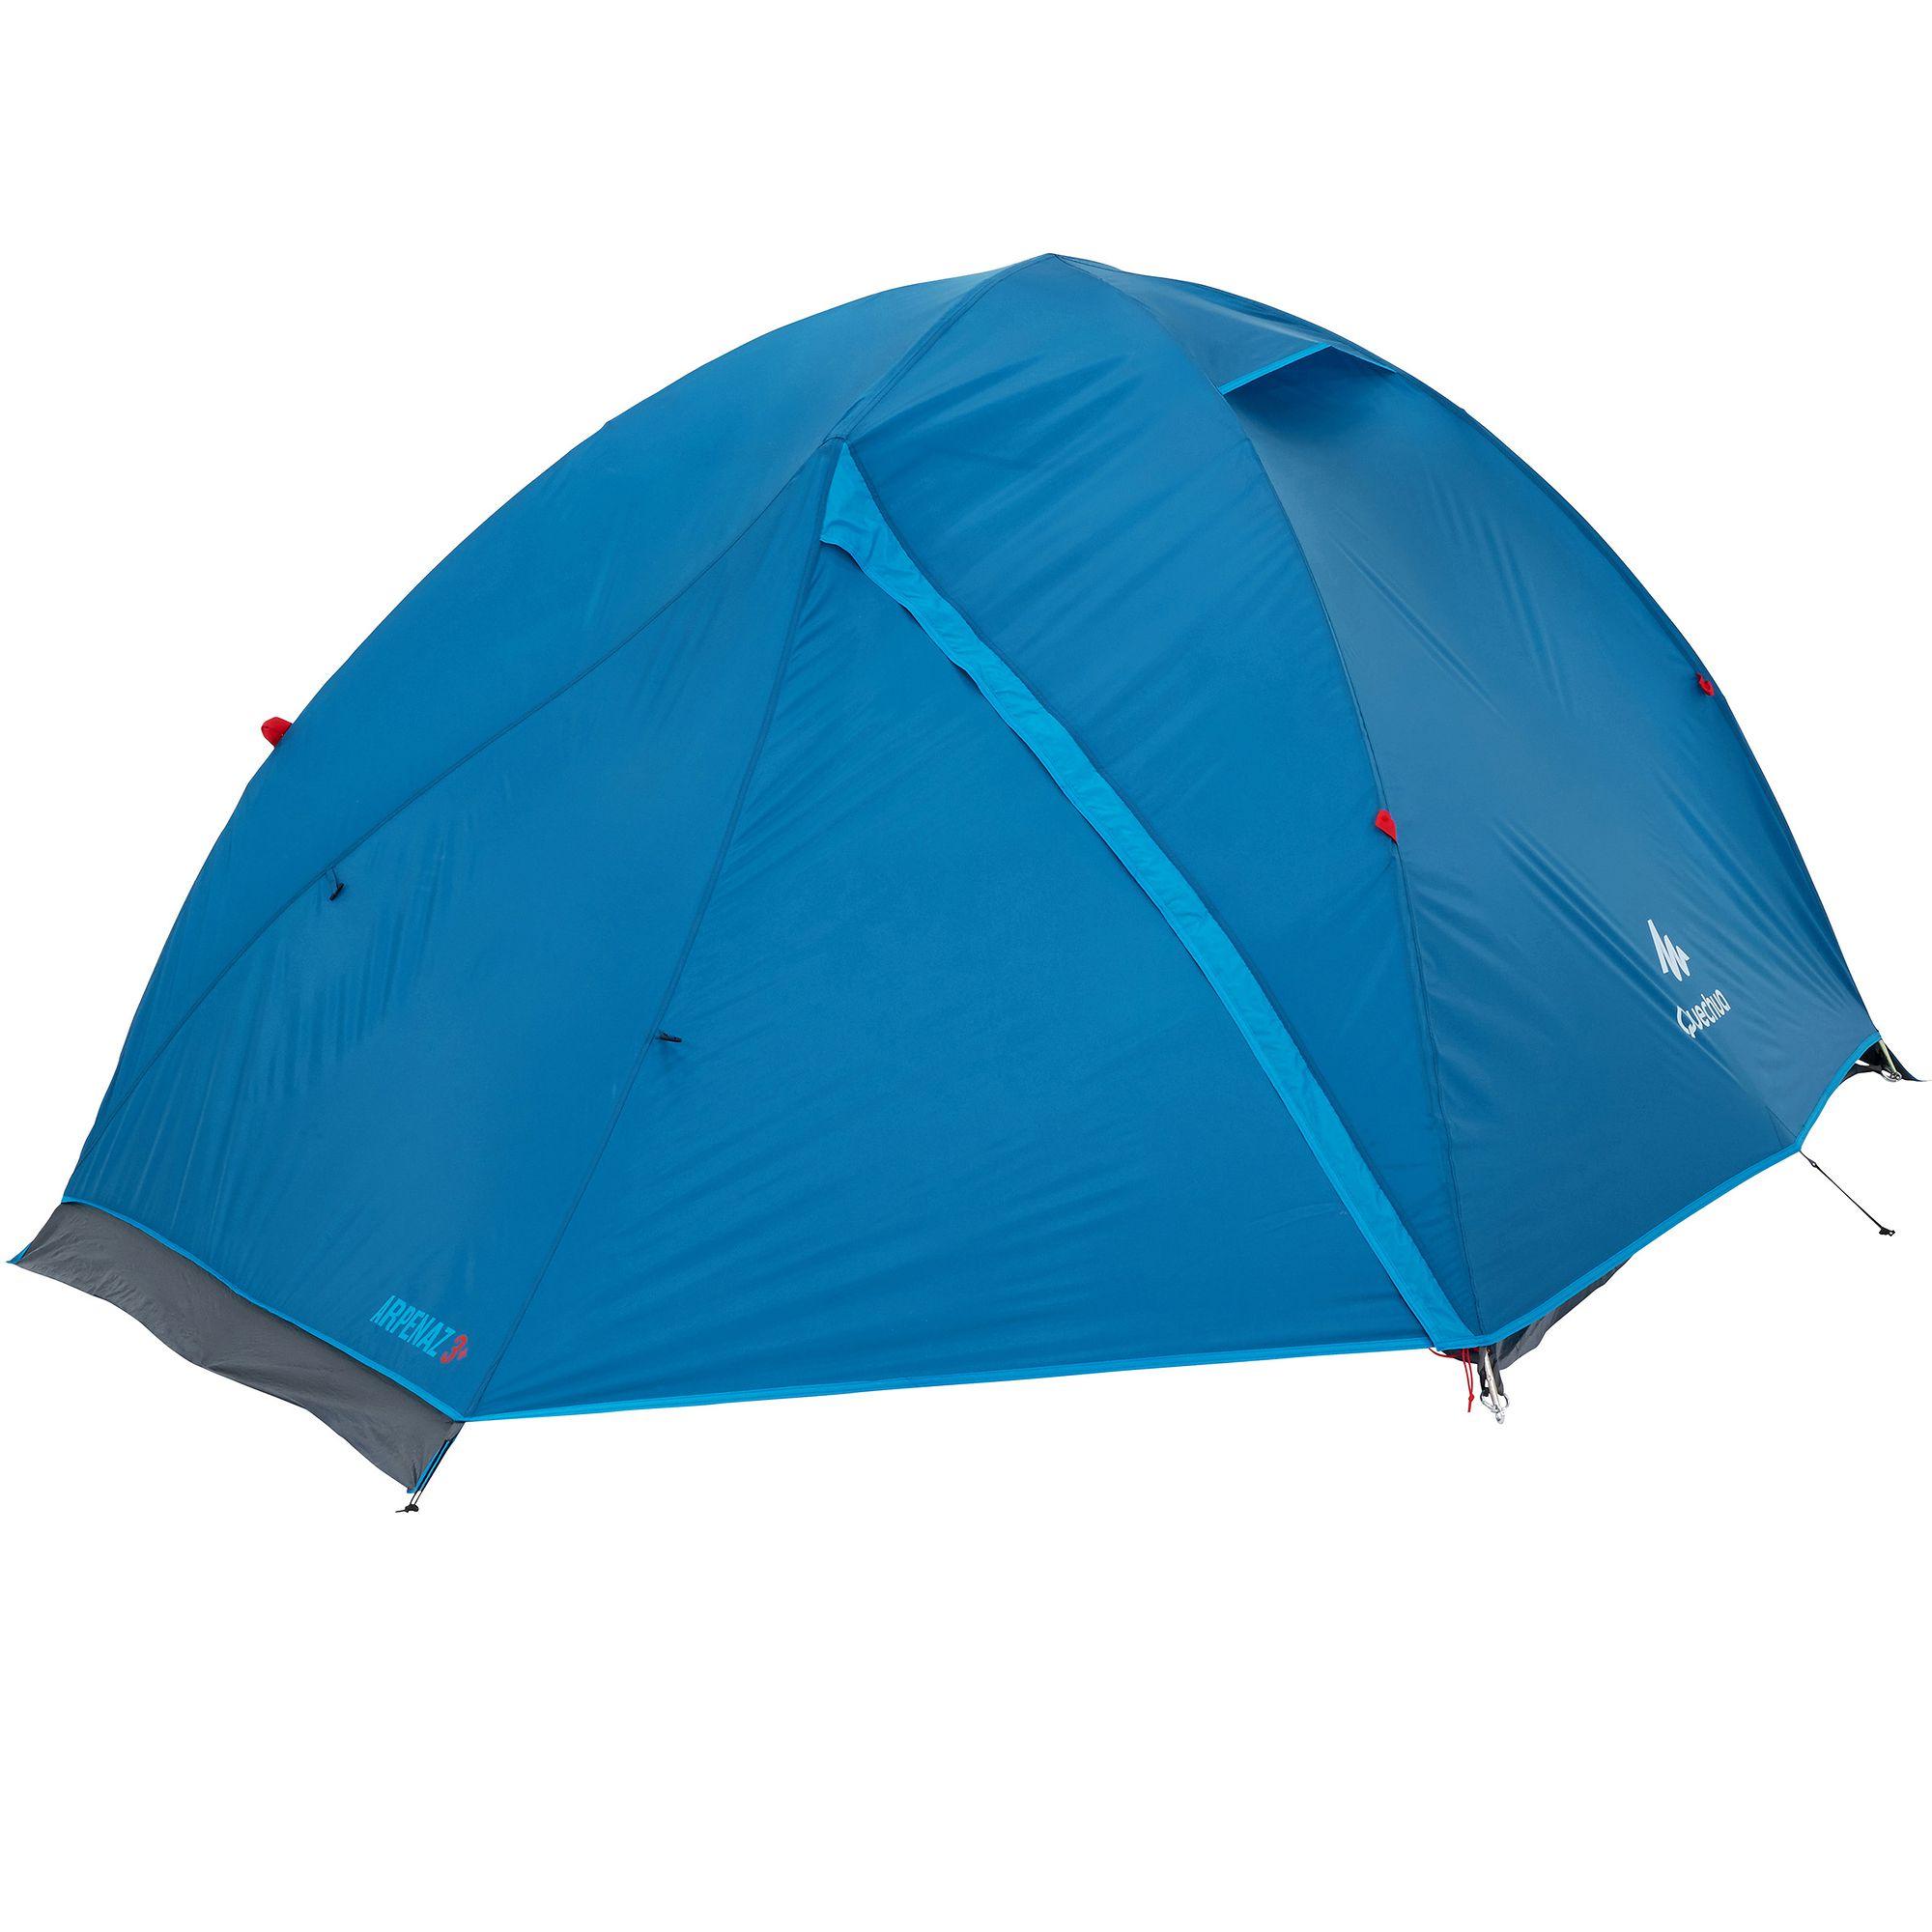 Tente de camping ARPENAZ 3+ | 3 personnes bleu